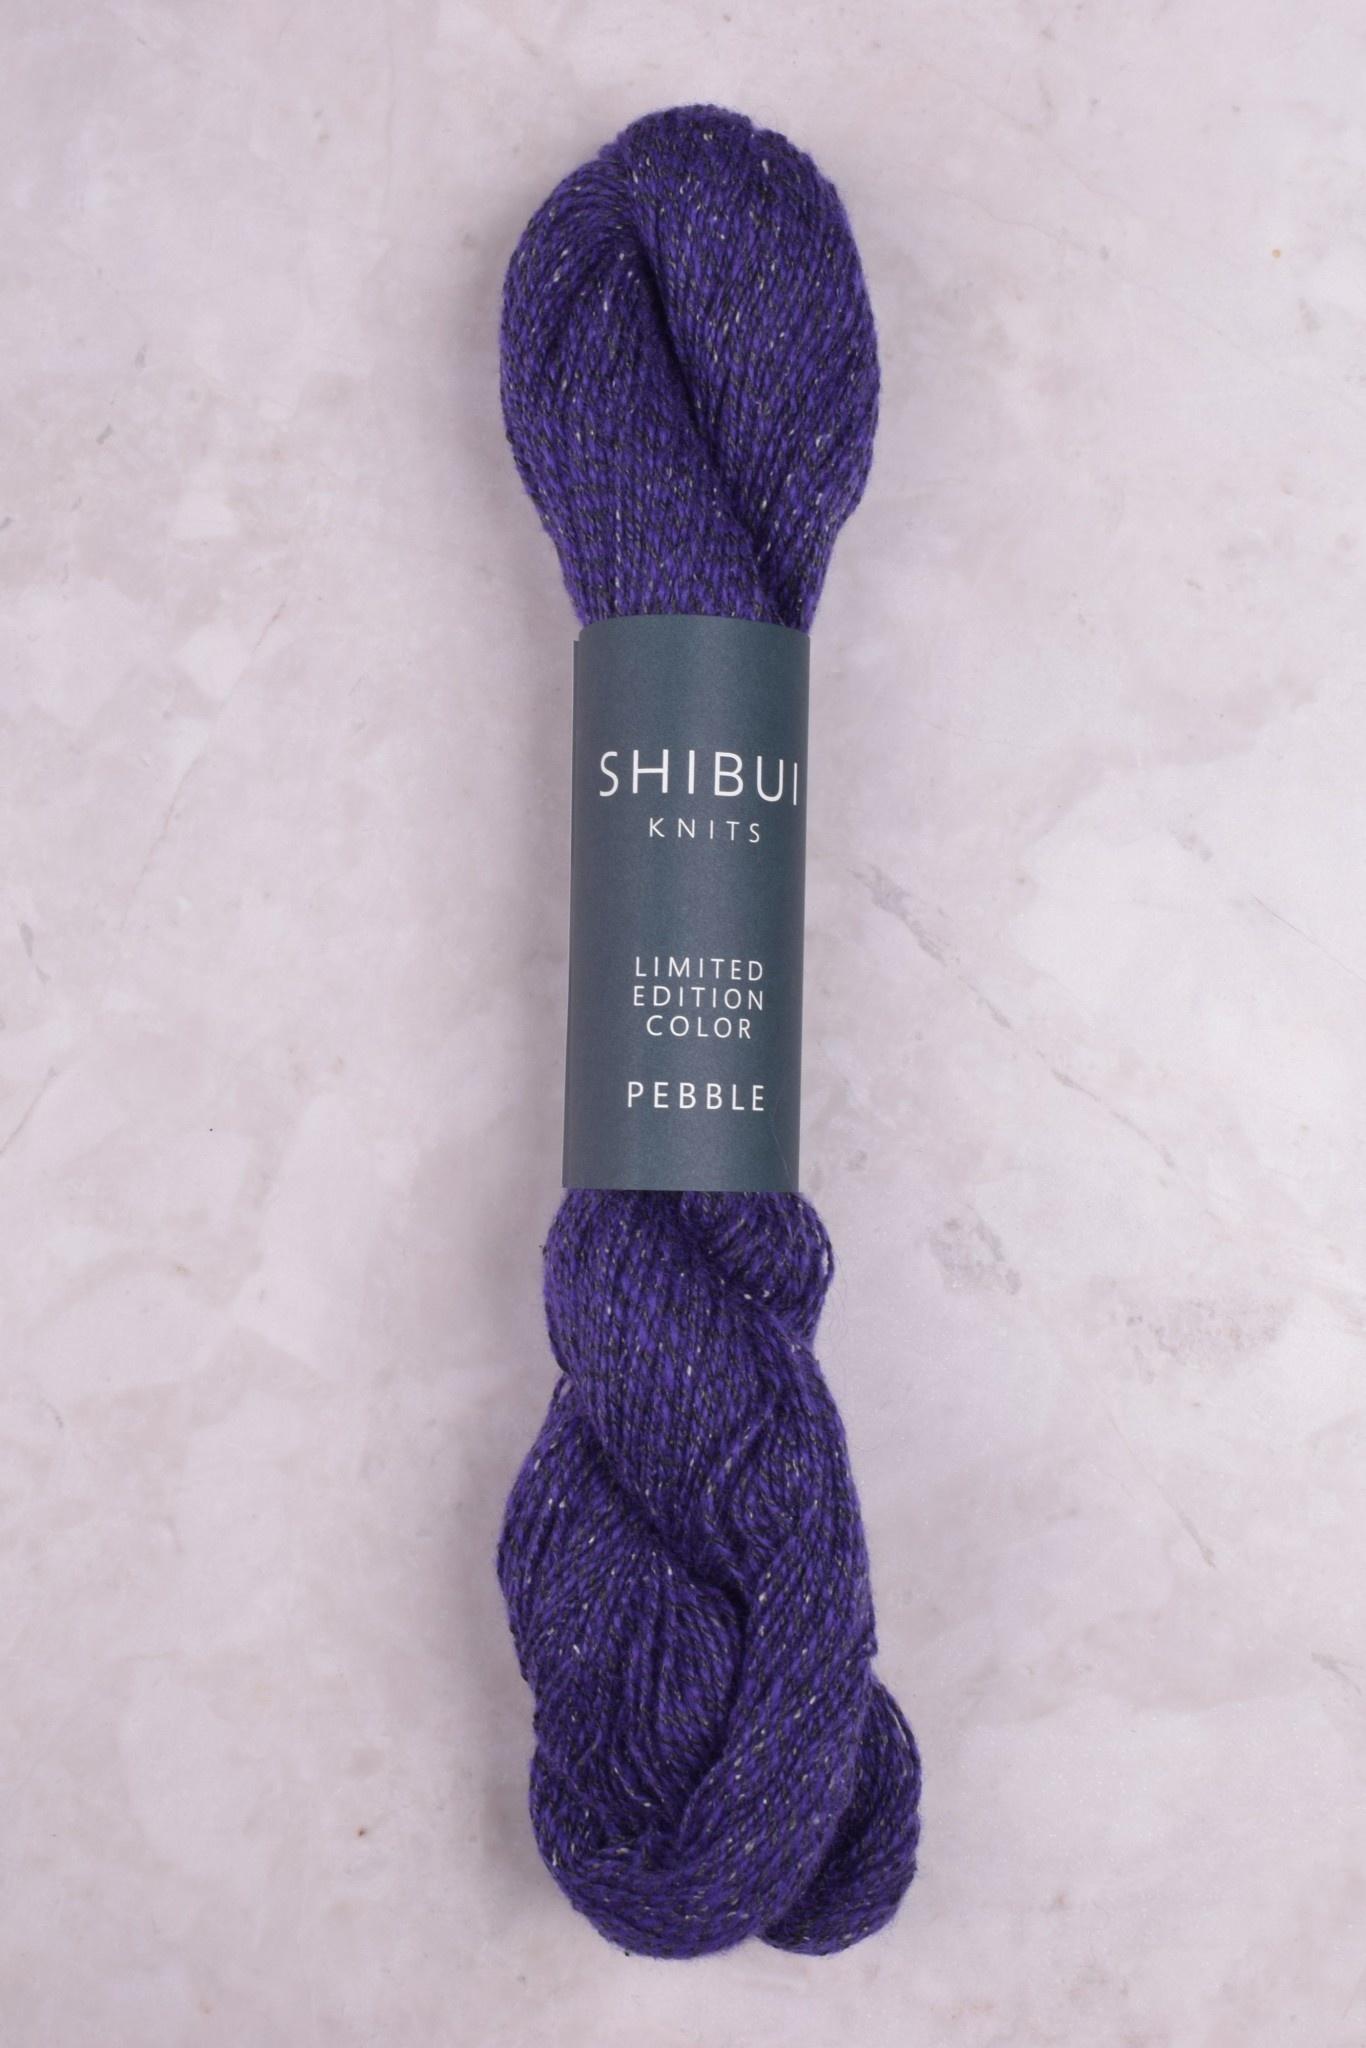 Image of Shibui Pebble 2197 Tyrian (Limited Edition)